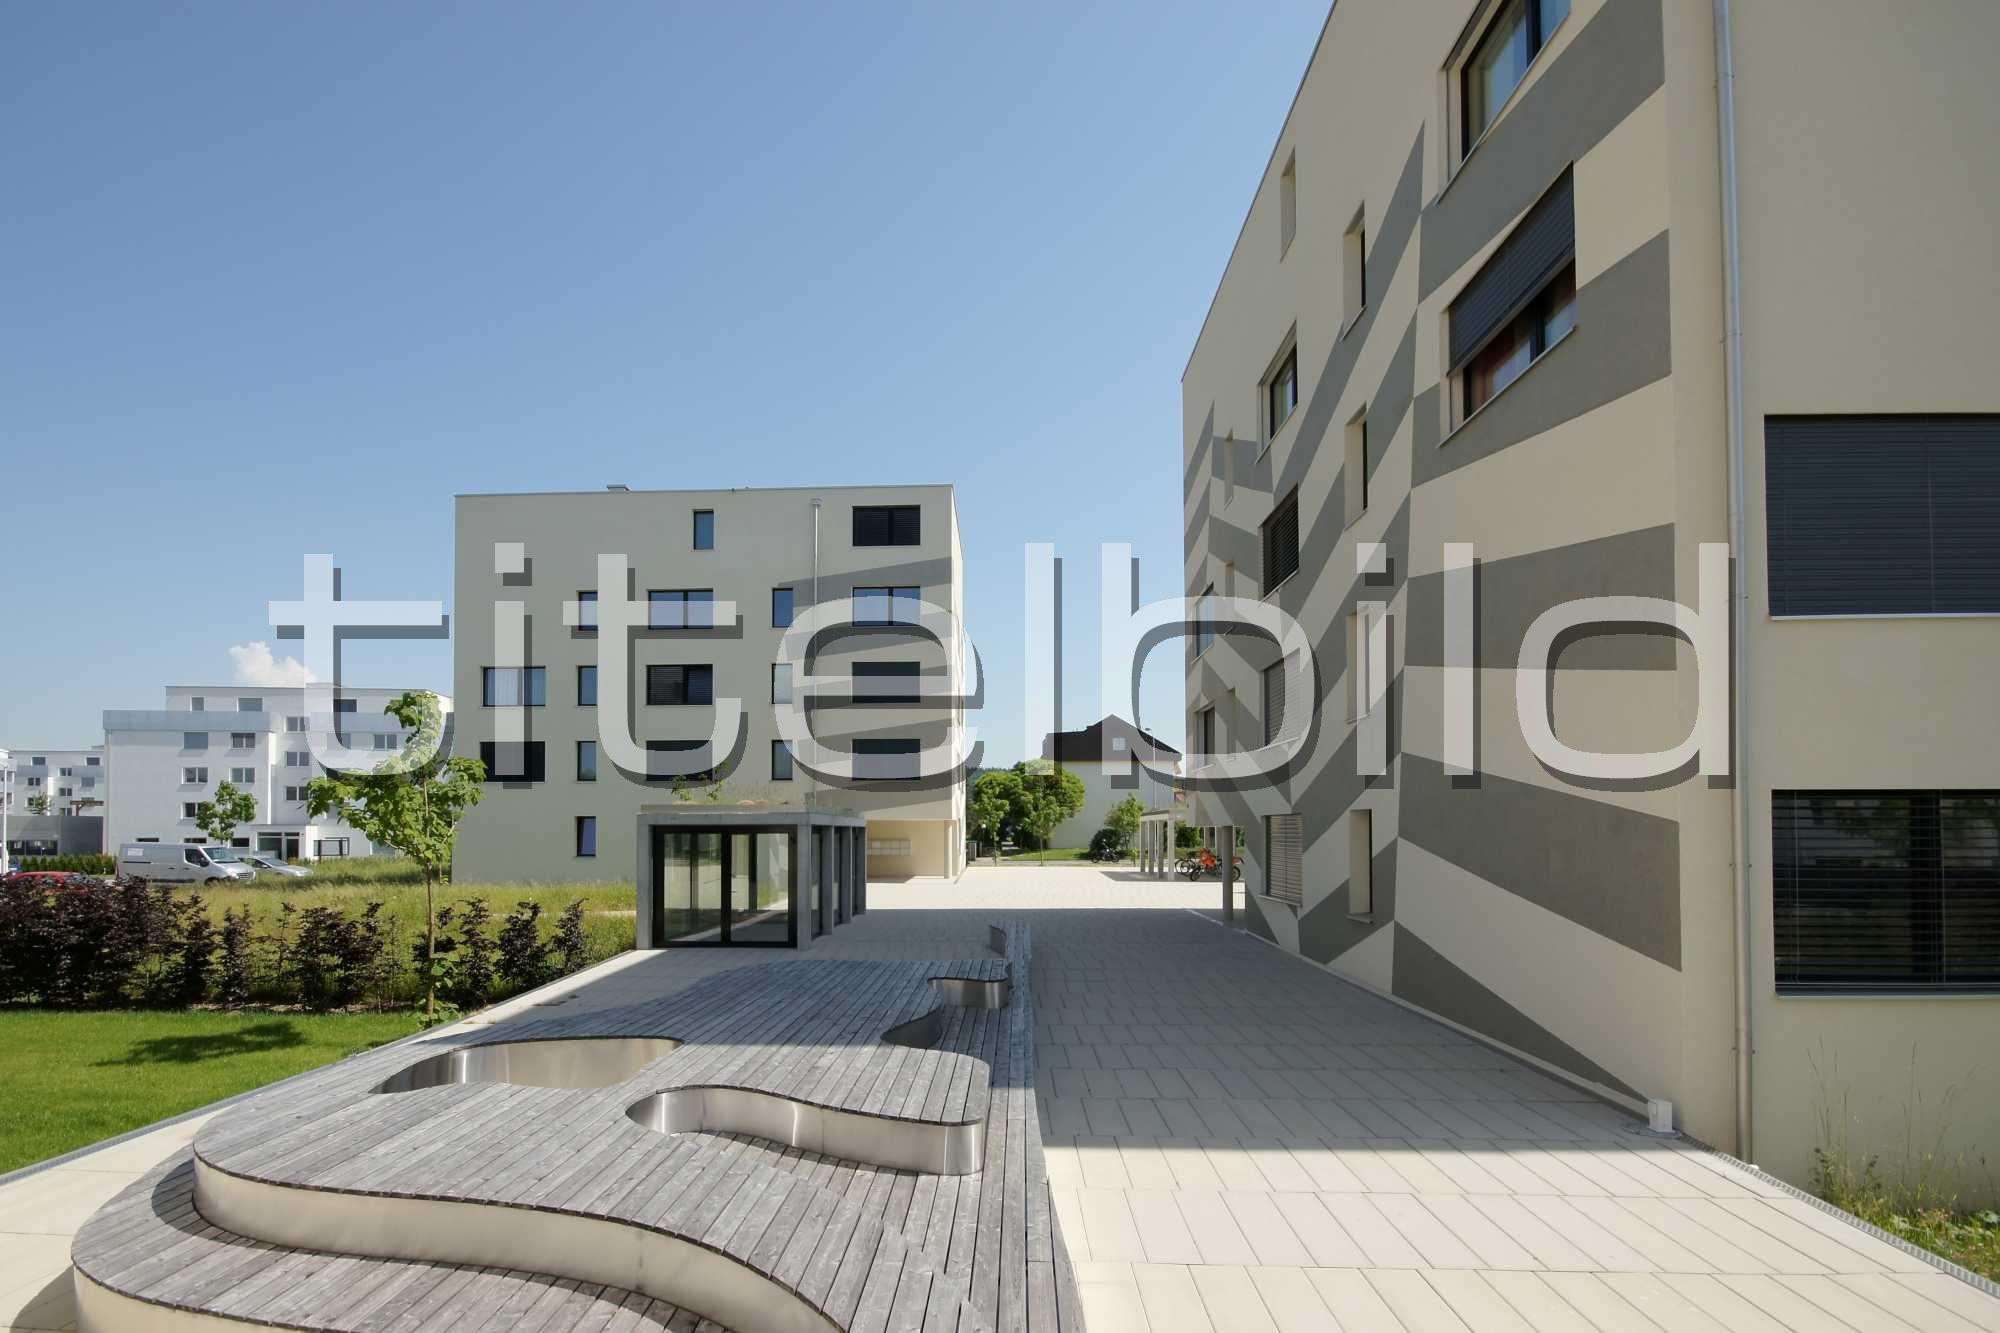 Projektbild-Nr. 0: Wohnüberbauung Dockland